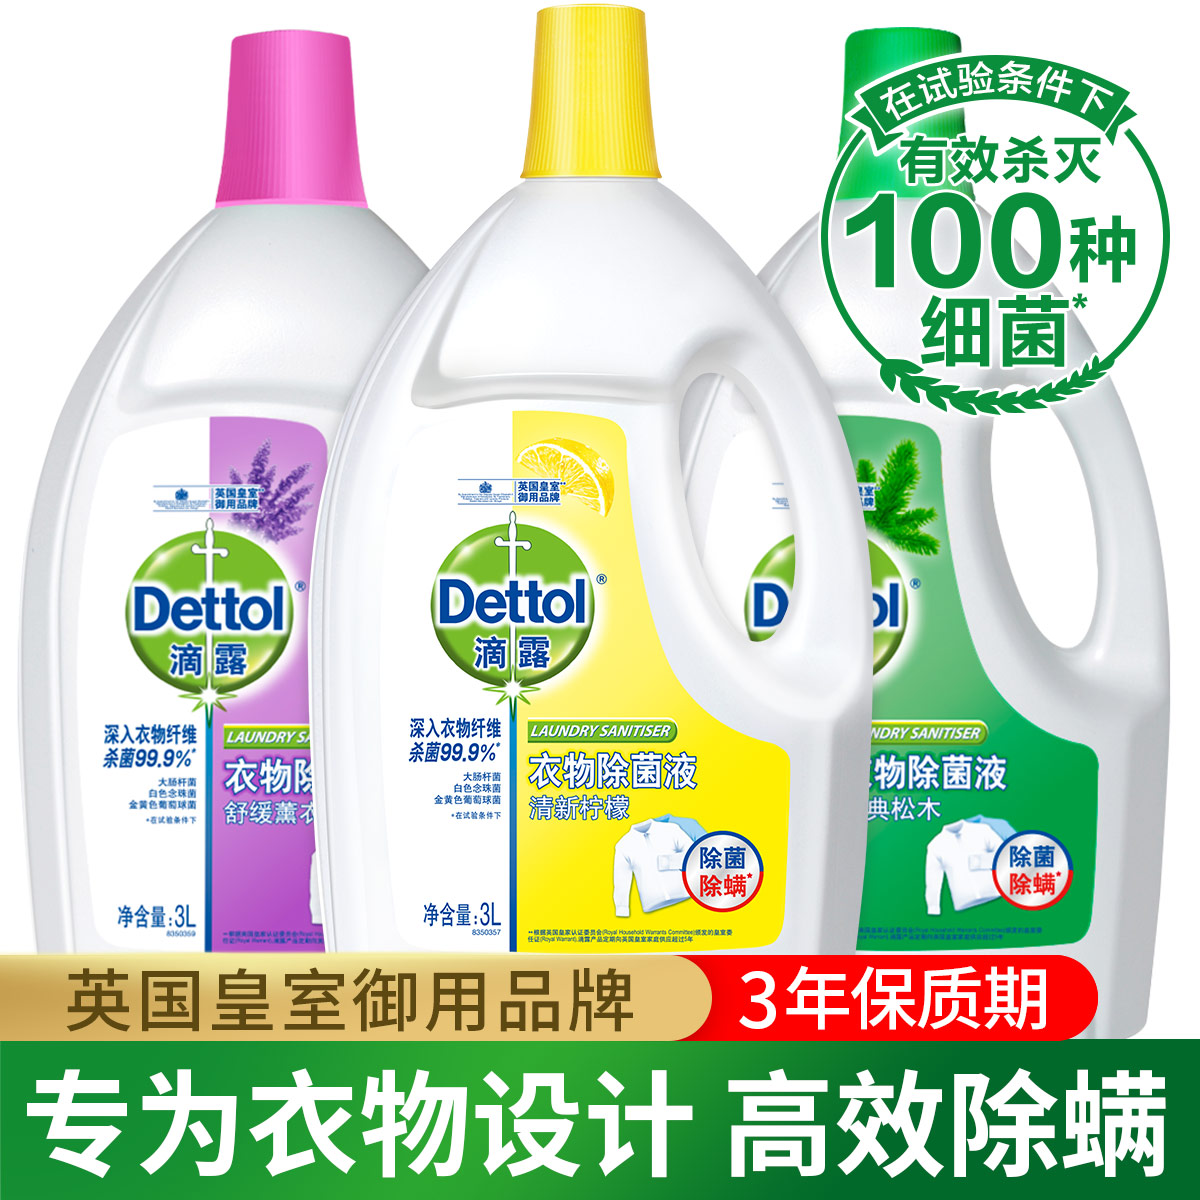 Dettol 【杀灭细菌100种】为衣物消毒设计滴露除螨衣物除菌液3L*3组合装